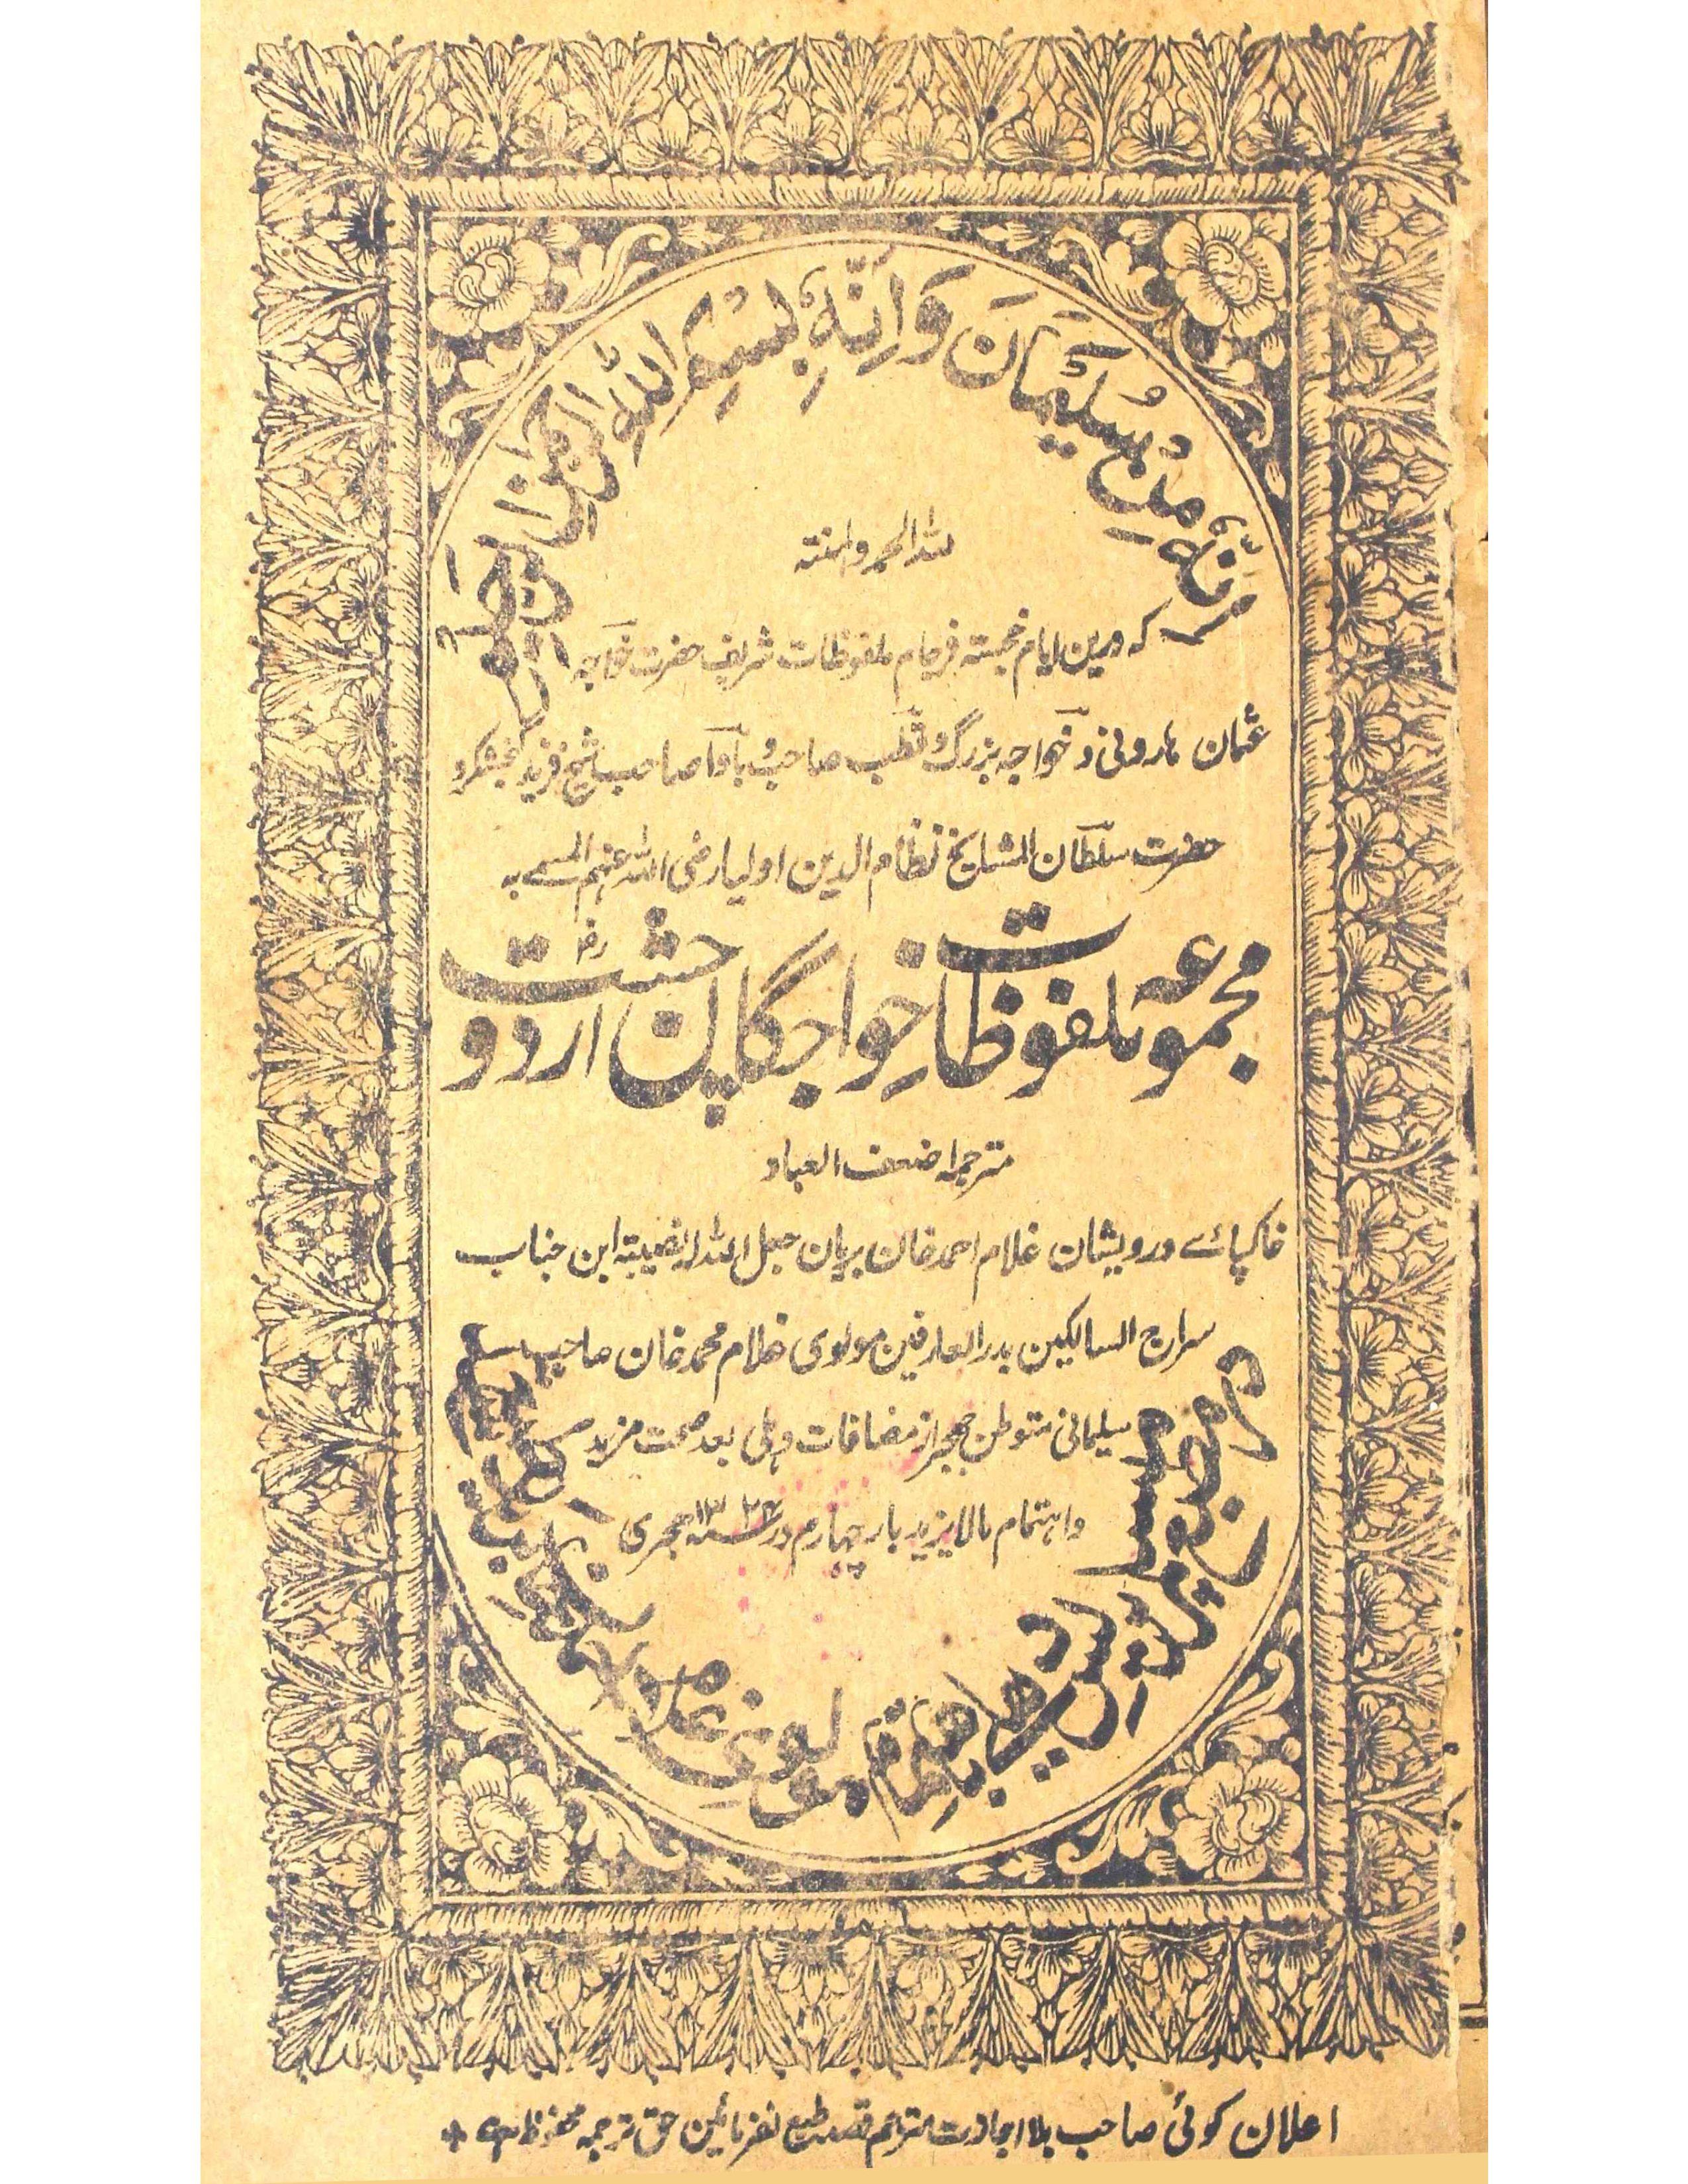 Majmua Malfuzat Khwajgan-e-Chisht Urdu